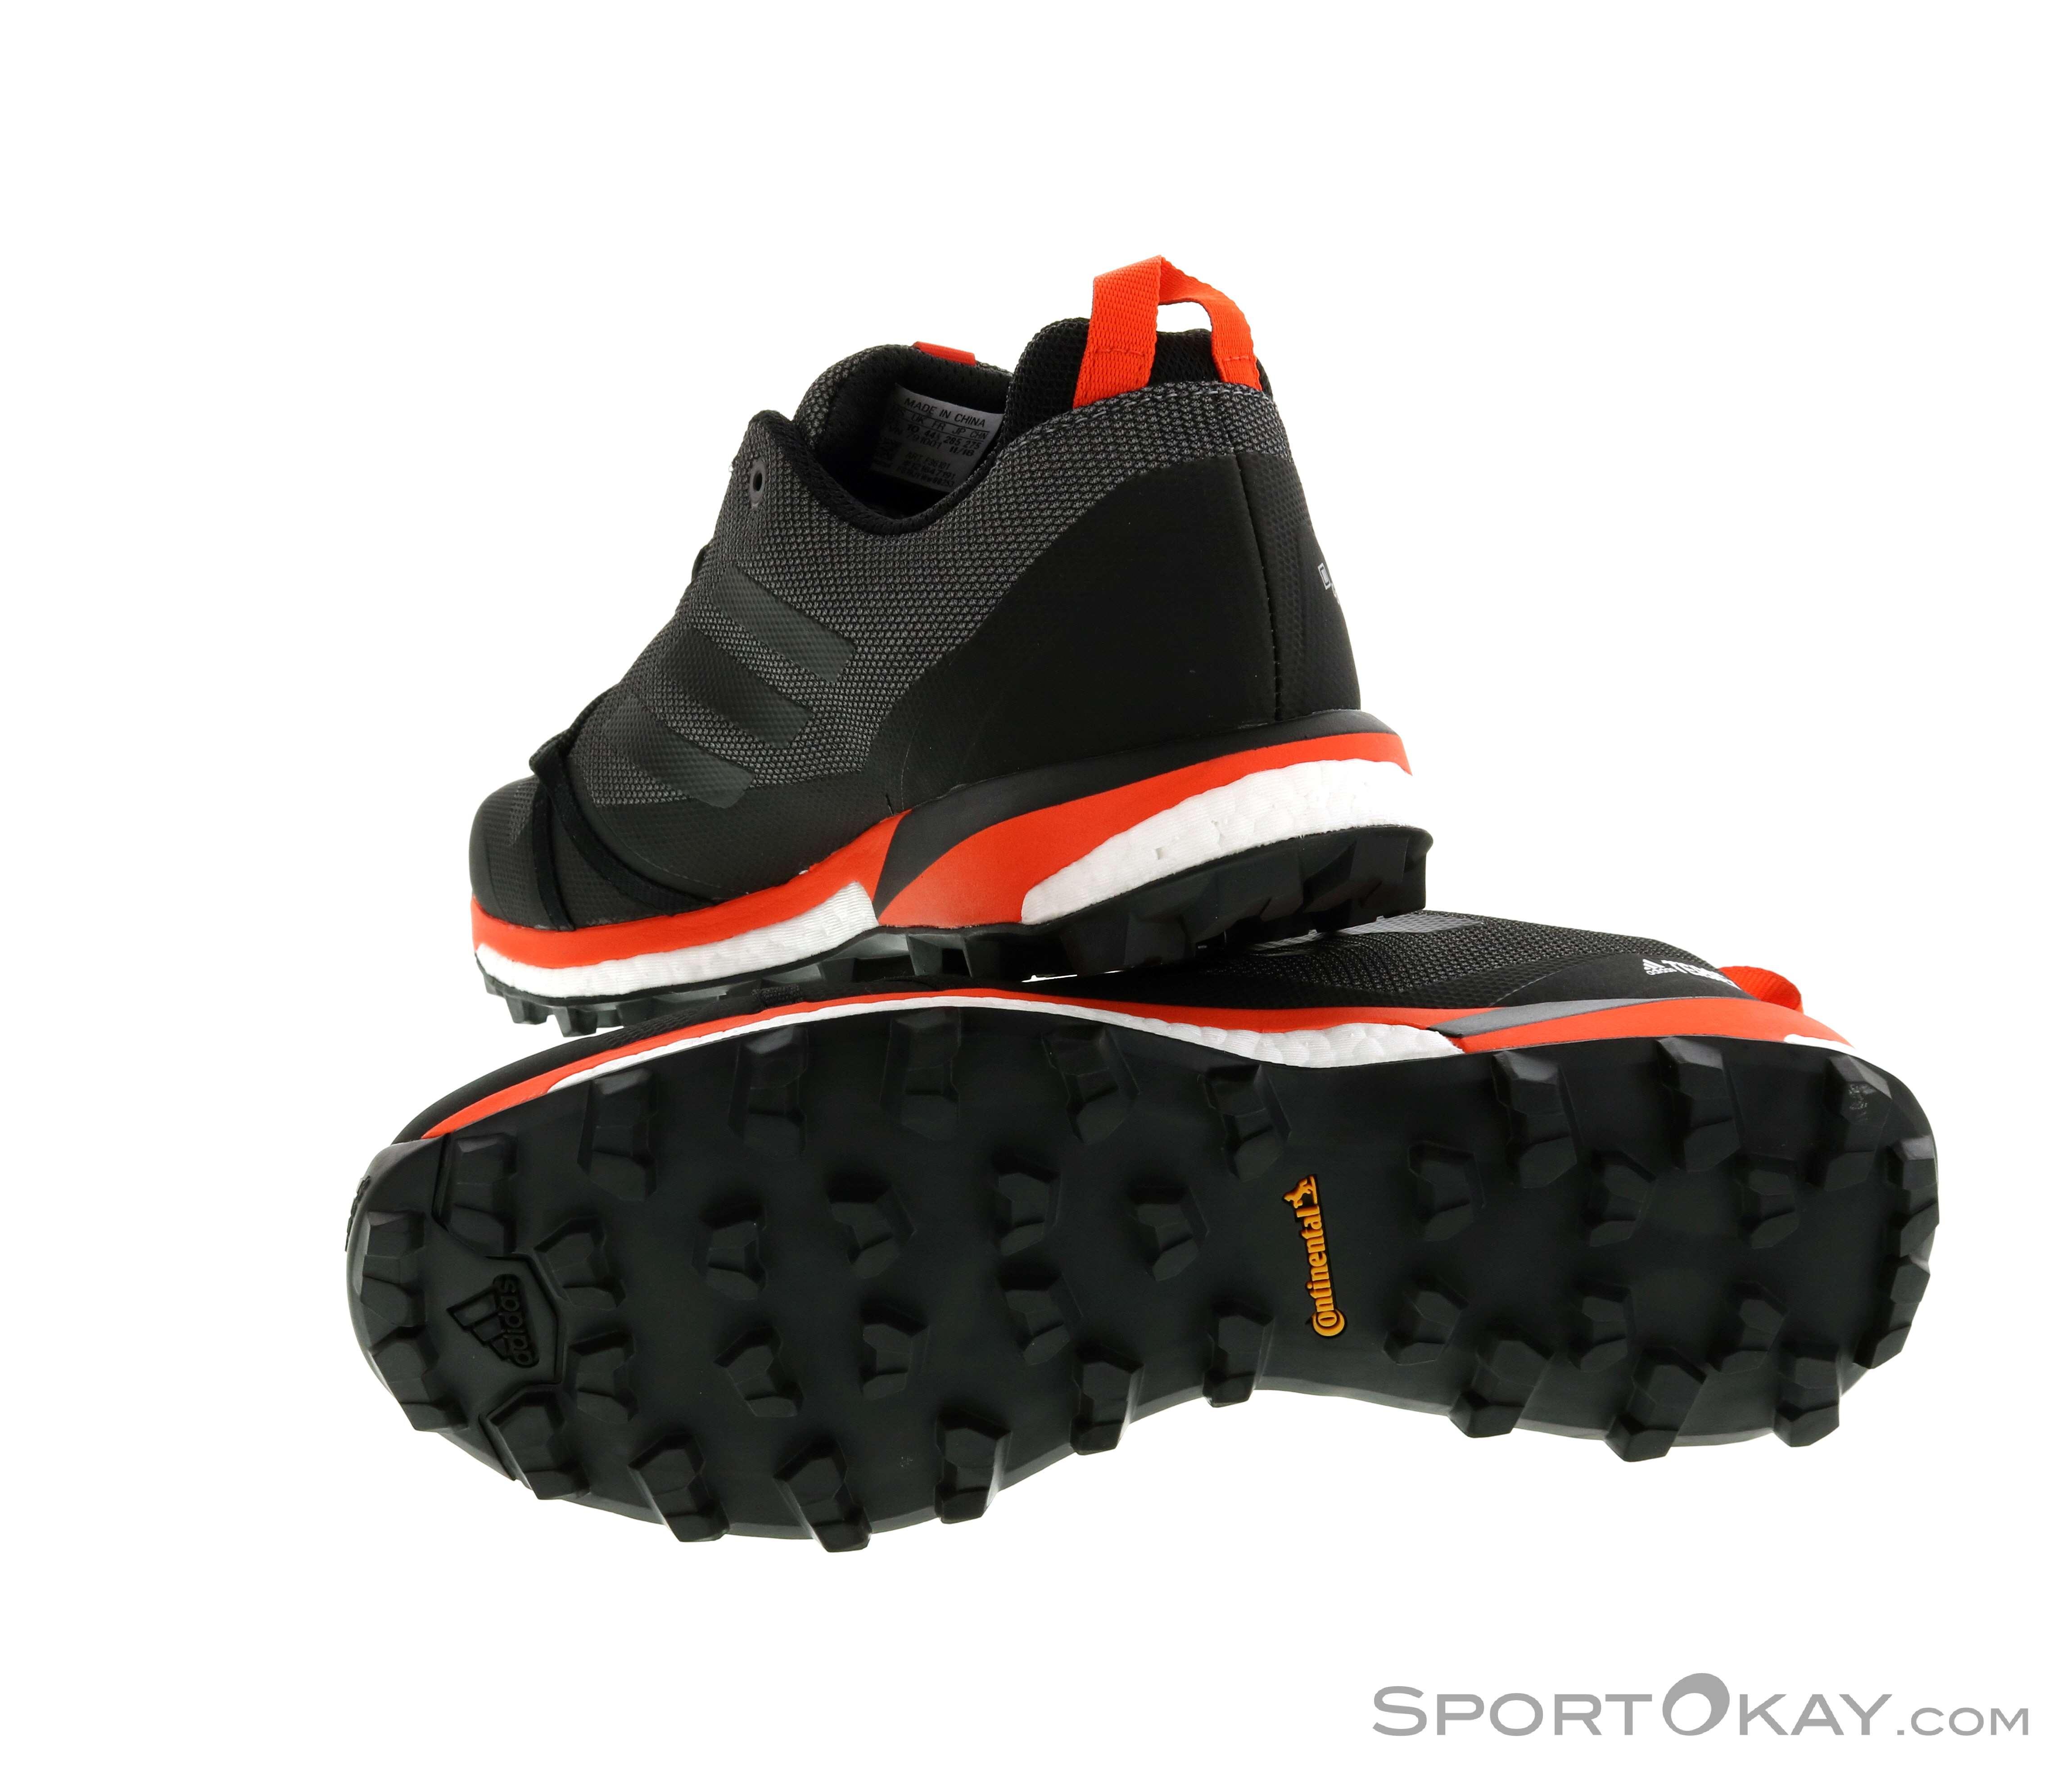 7a7594072 adidas Terrex Skychaser LT Mens Trekking Shoes Gore-Tex - Trekking ...